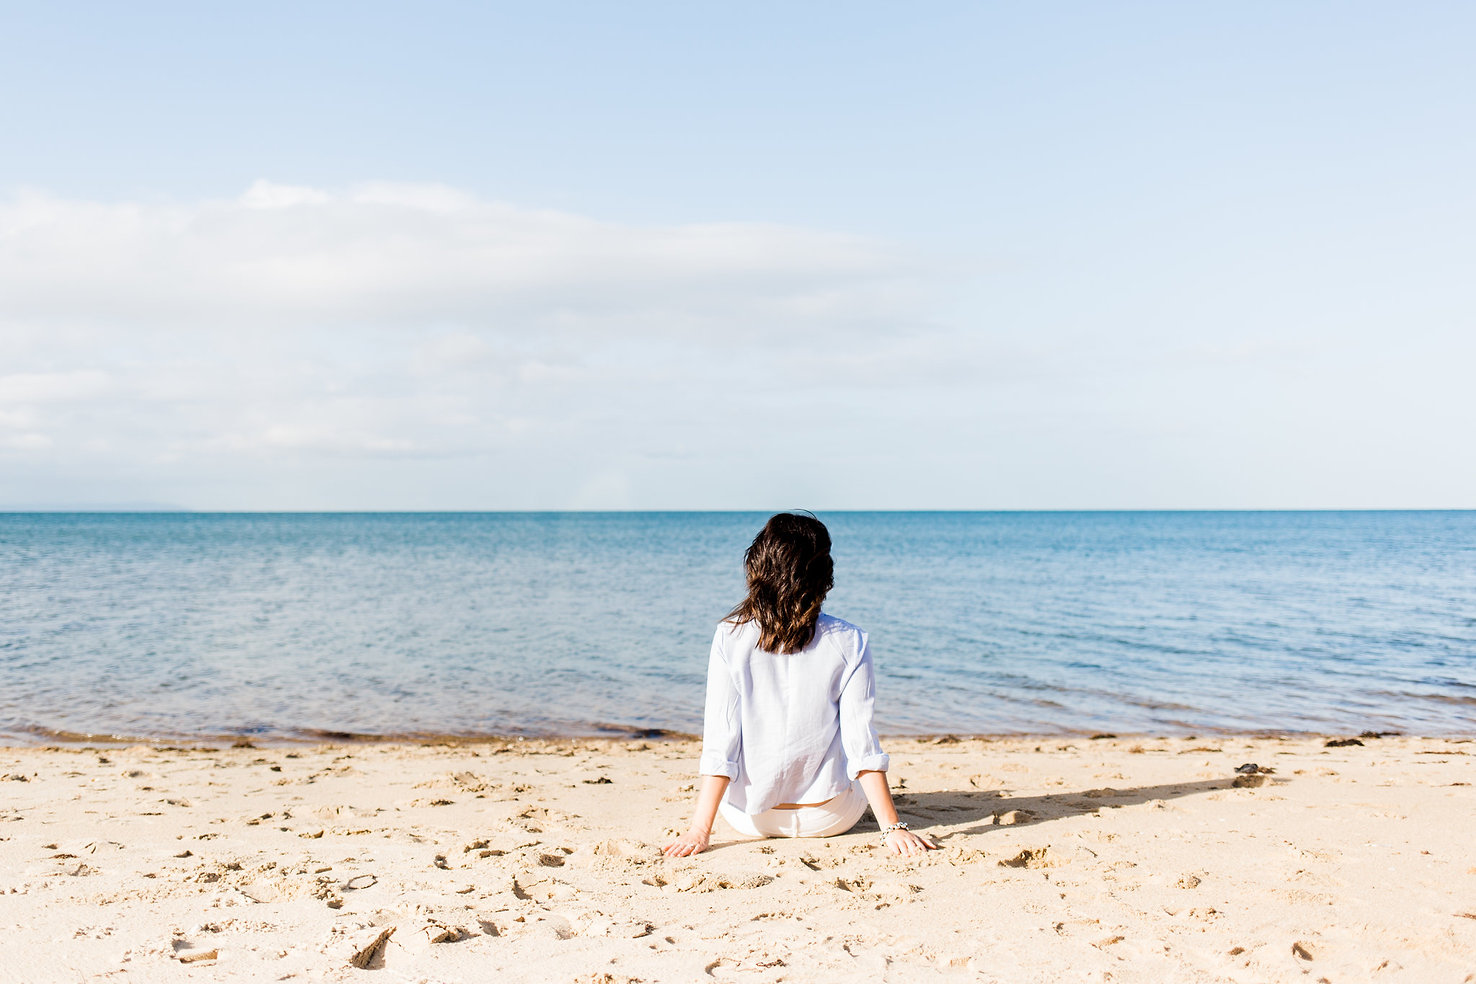 Woman reflecting on beach